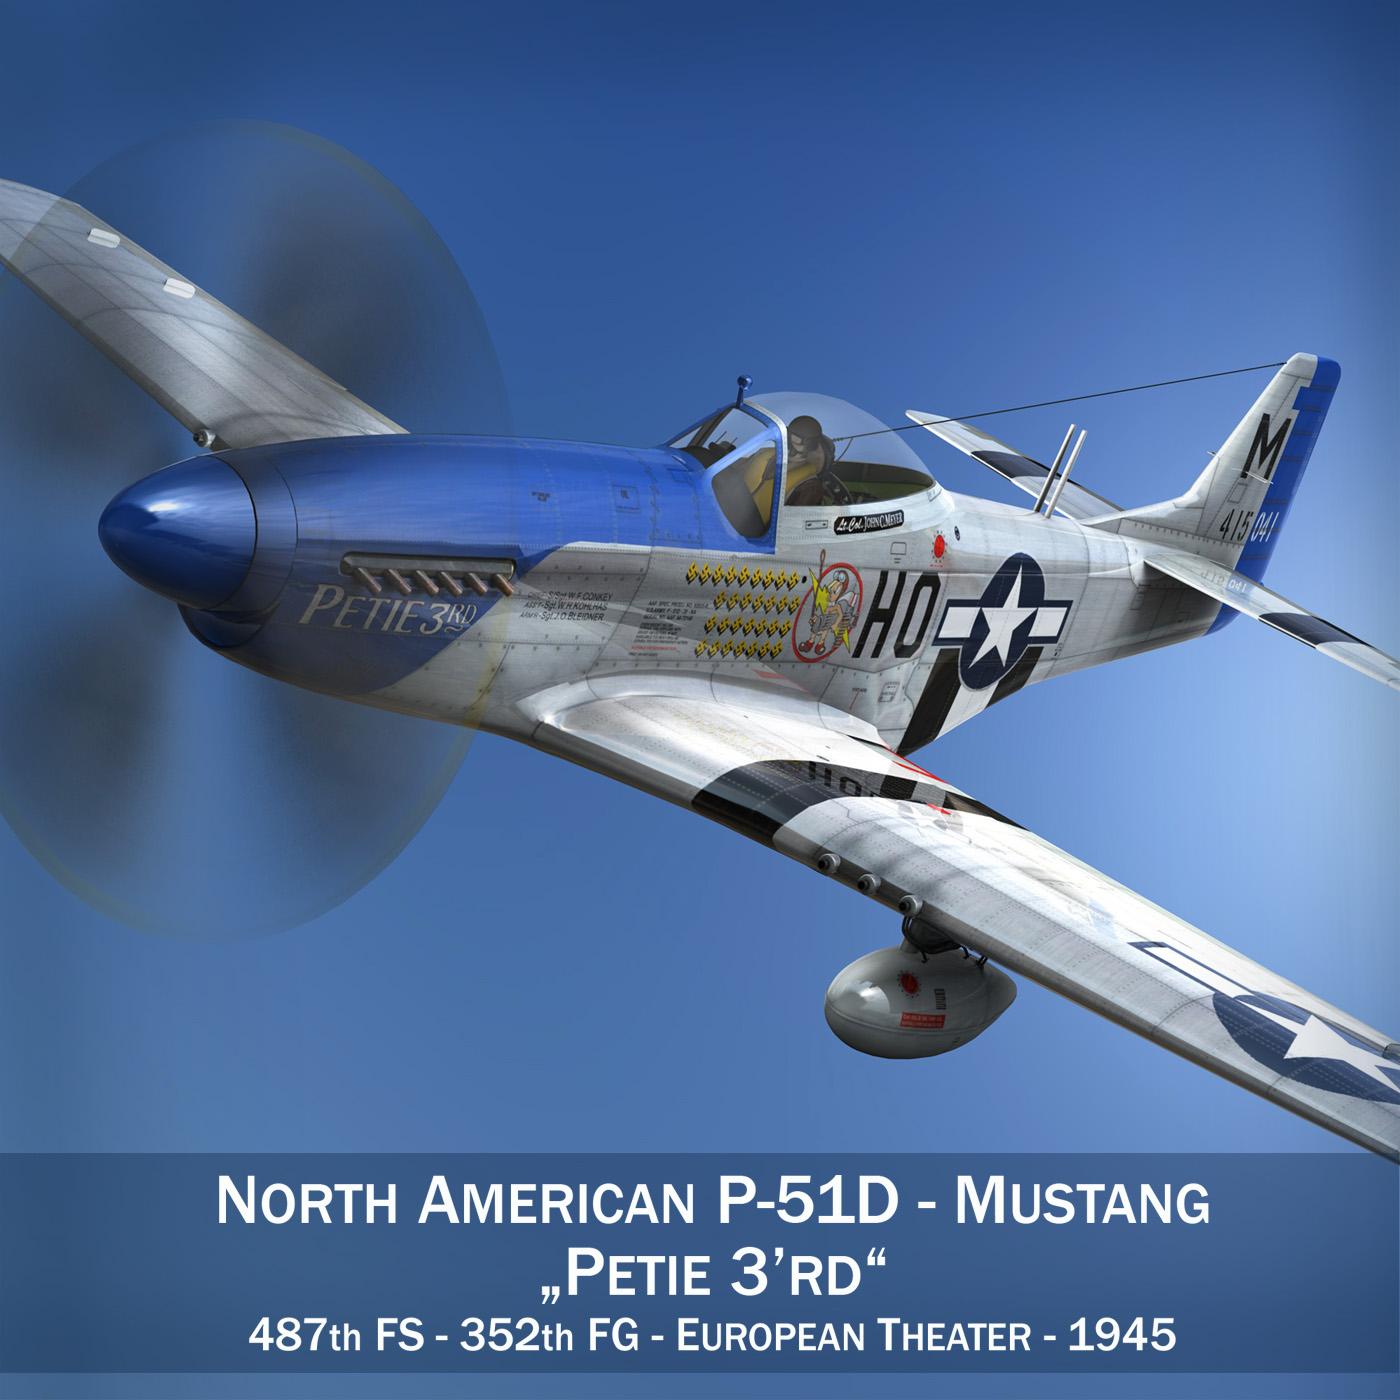 north american p-51d mustang – petie 3rd 3d model fbx c4d lwo obj 280127